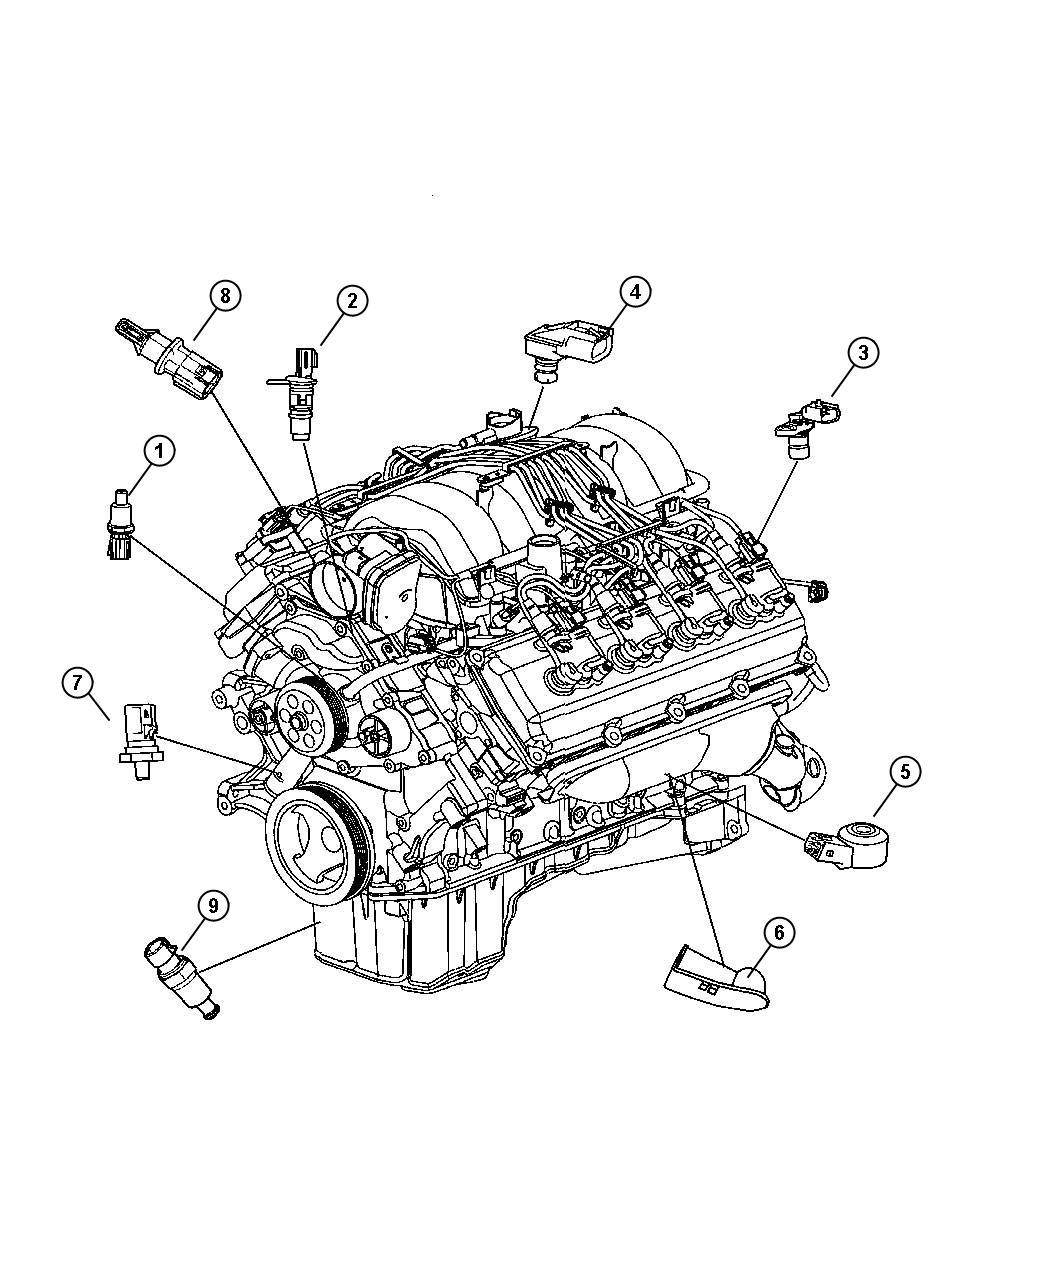 5 7 hemi engine diagram part 2003 dodge ram 1500 5 7 hemi engine diagram